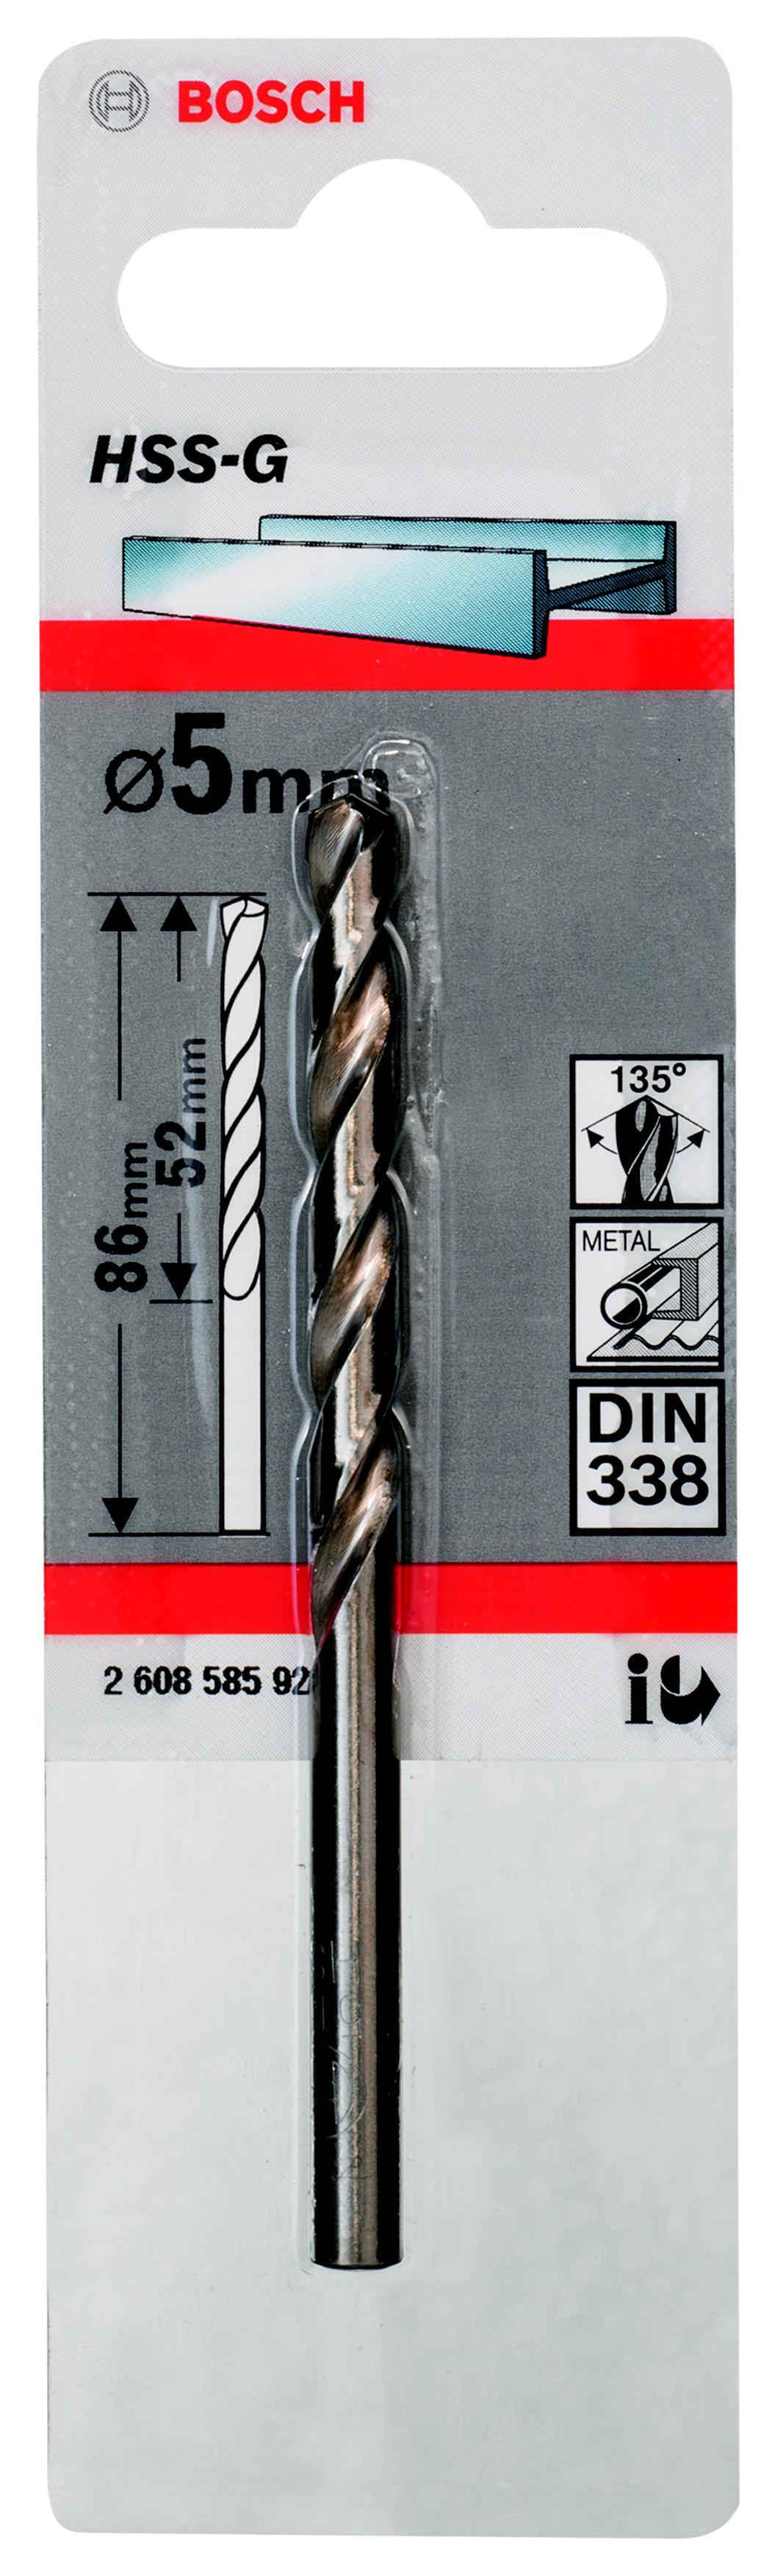 Сверло по металлу Bosch Hss-g standardline 5.0 мм (2.608.585.922) пила дисковая bosch gks 55 g 601682000